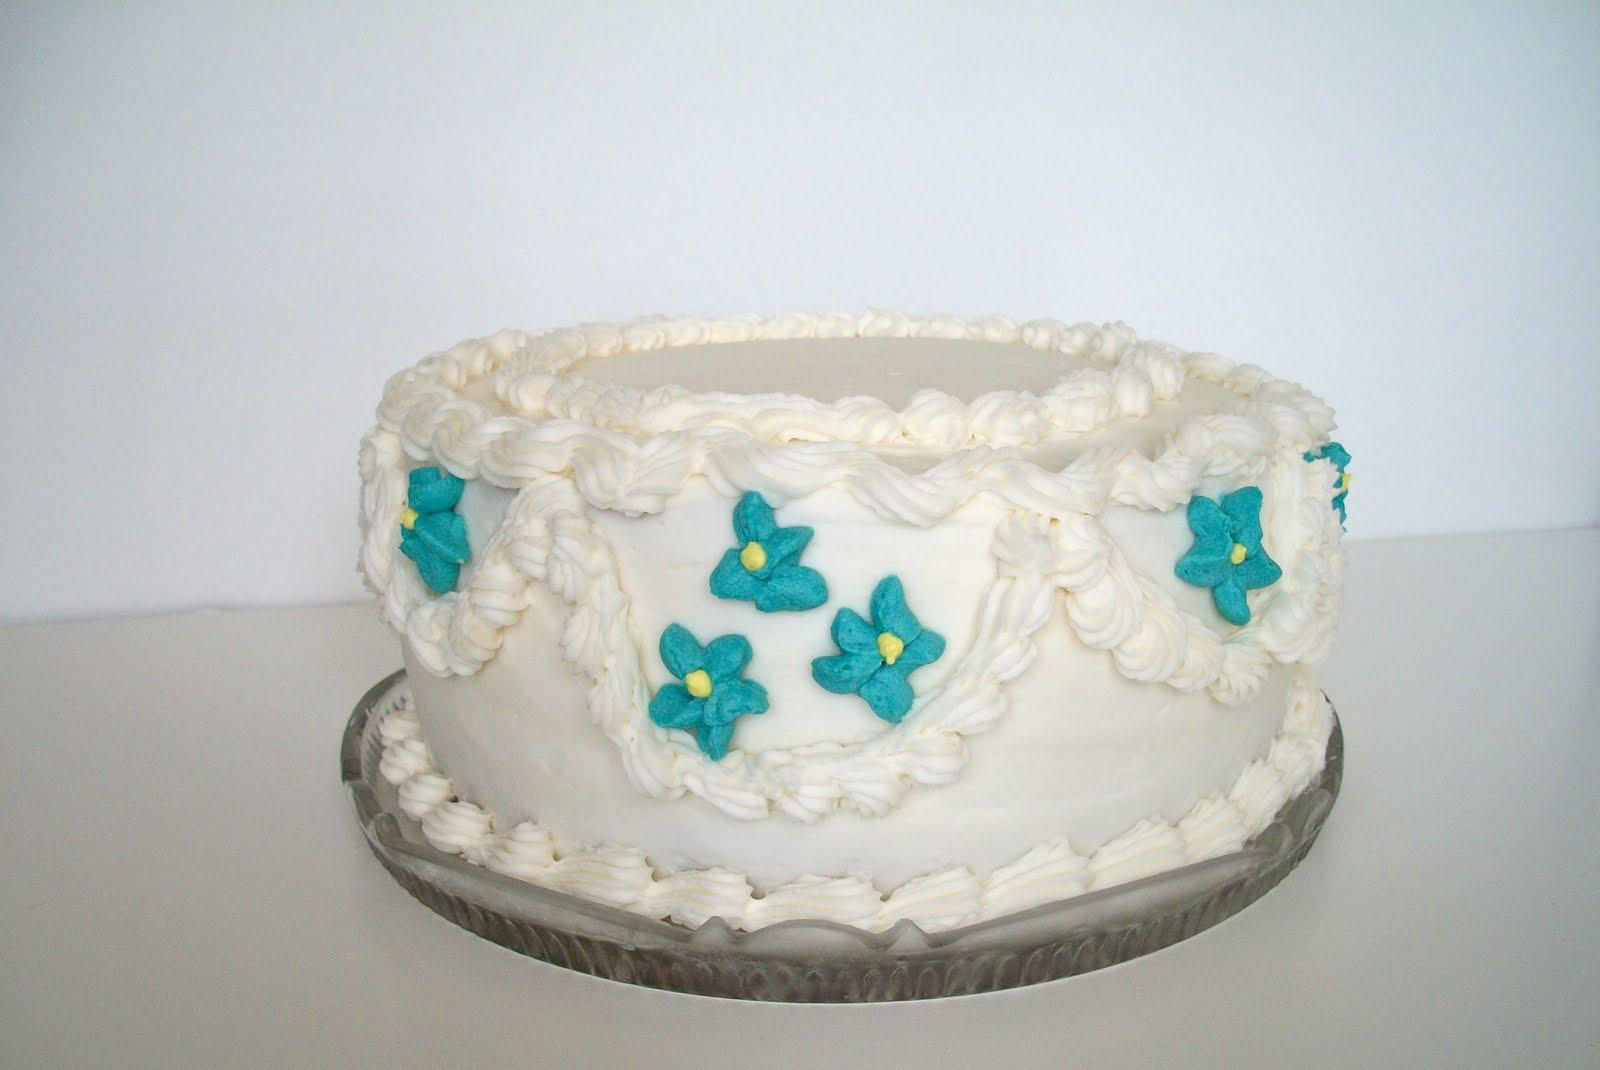 Brooke Bakes : 25th Wedding Anniversary Cake